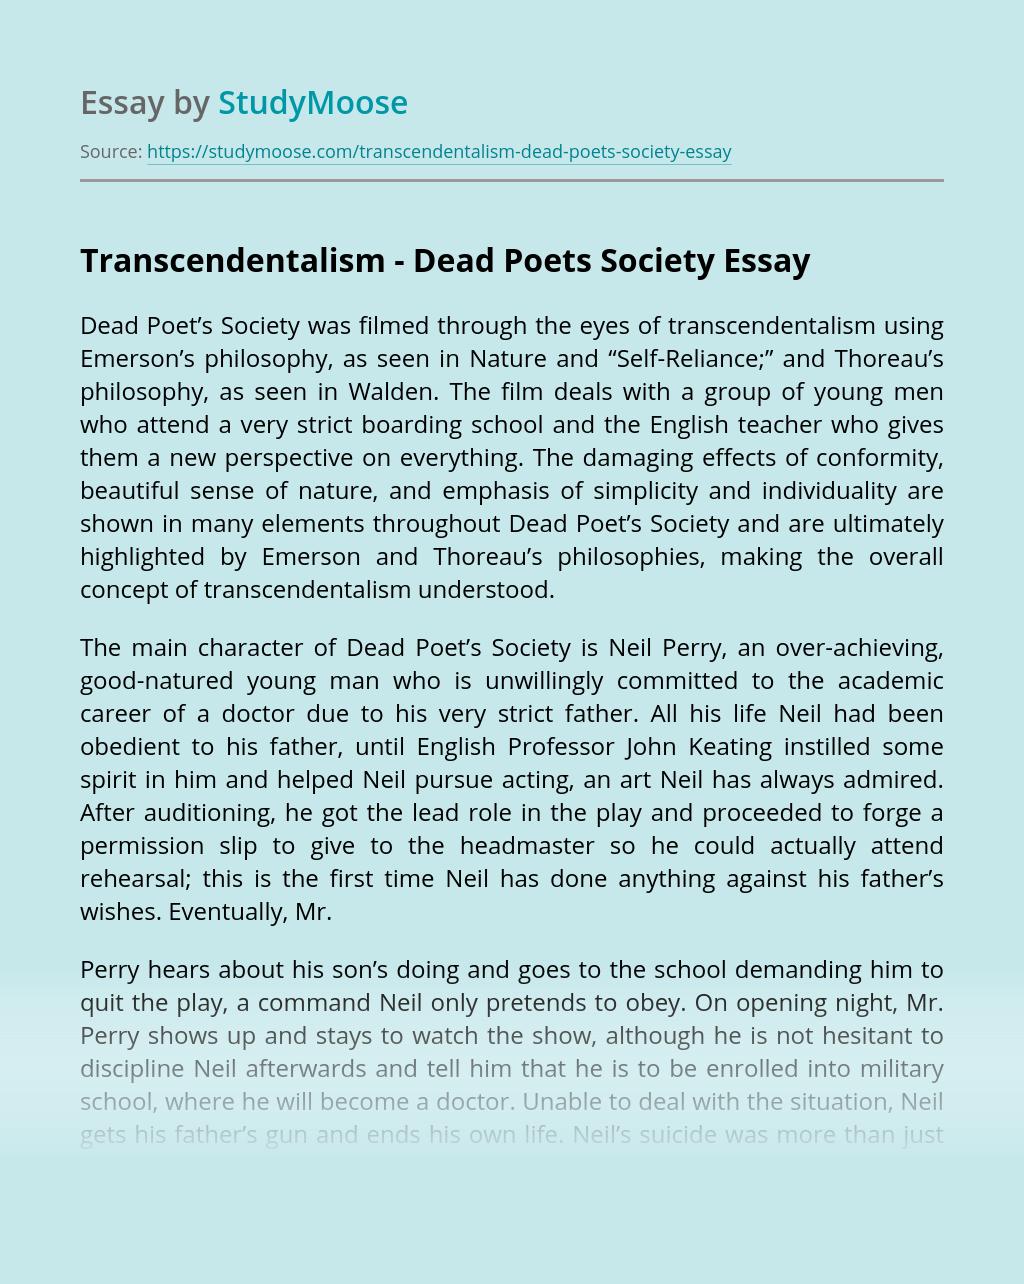 Transcendentalism - Dead Poets Society